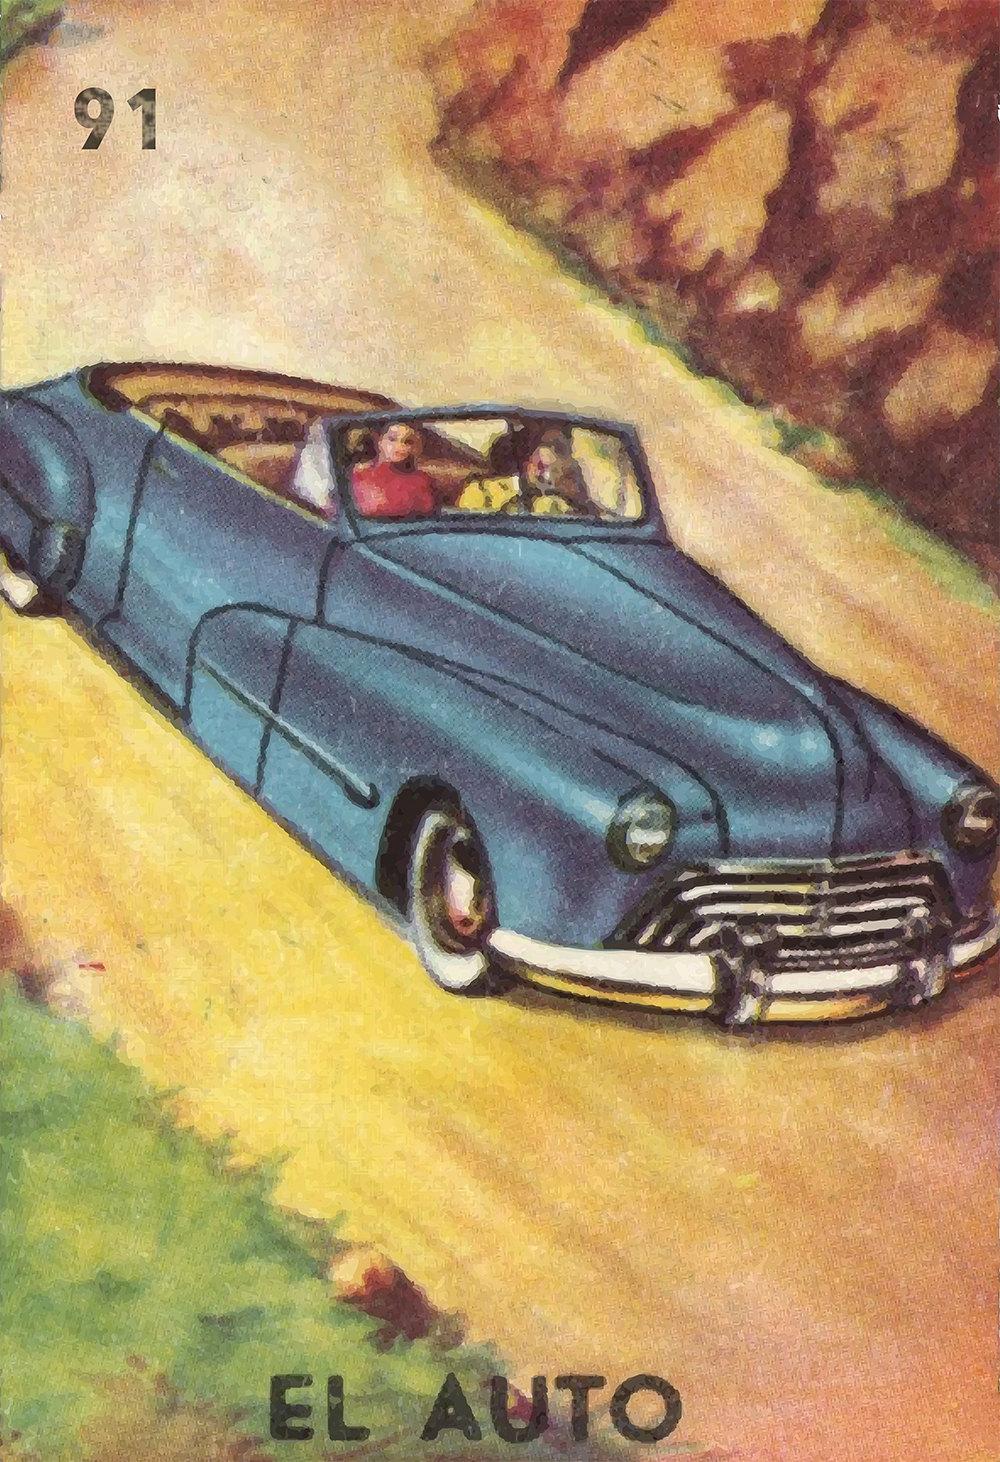 Loteria El Auto Mexican Retro Illustration Art Print Vintage Giclee ...